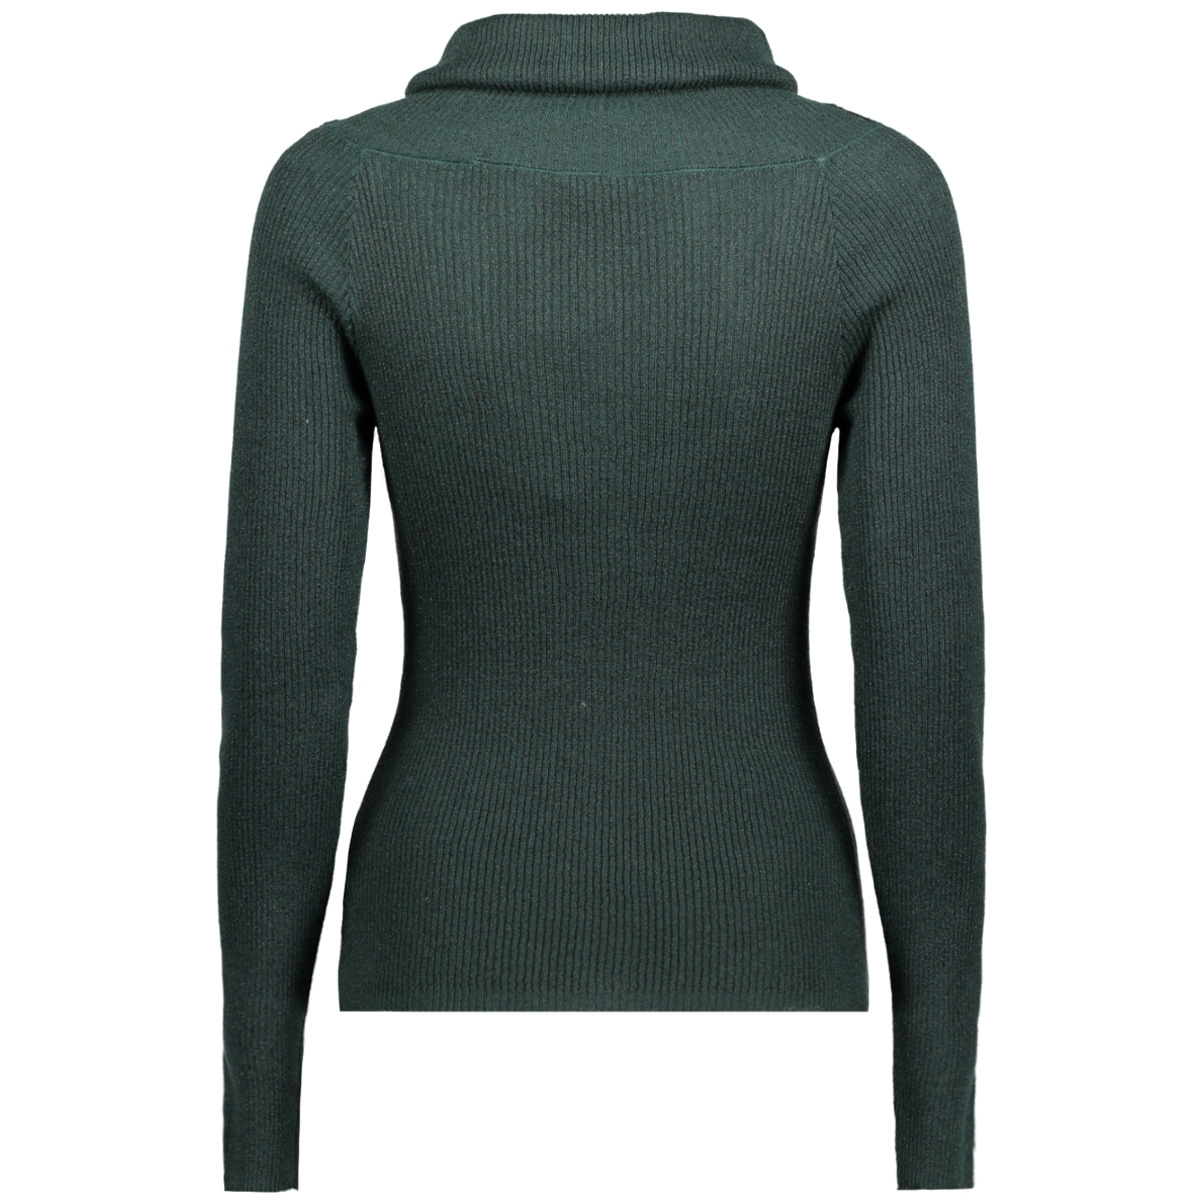 vivenna l/s offshoulder knit top 14043817 vila trui pine grove/black lure